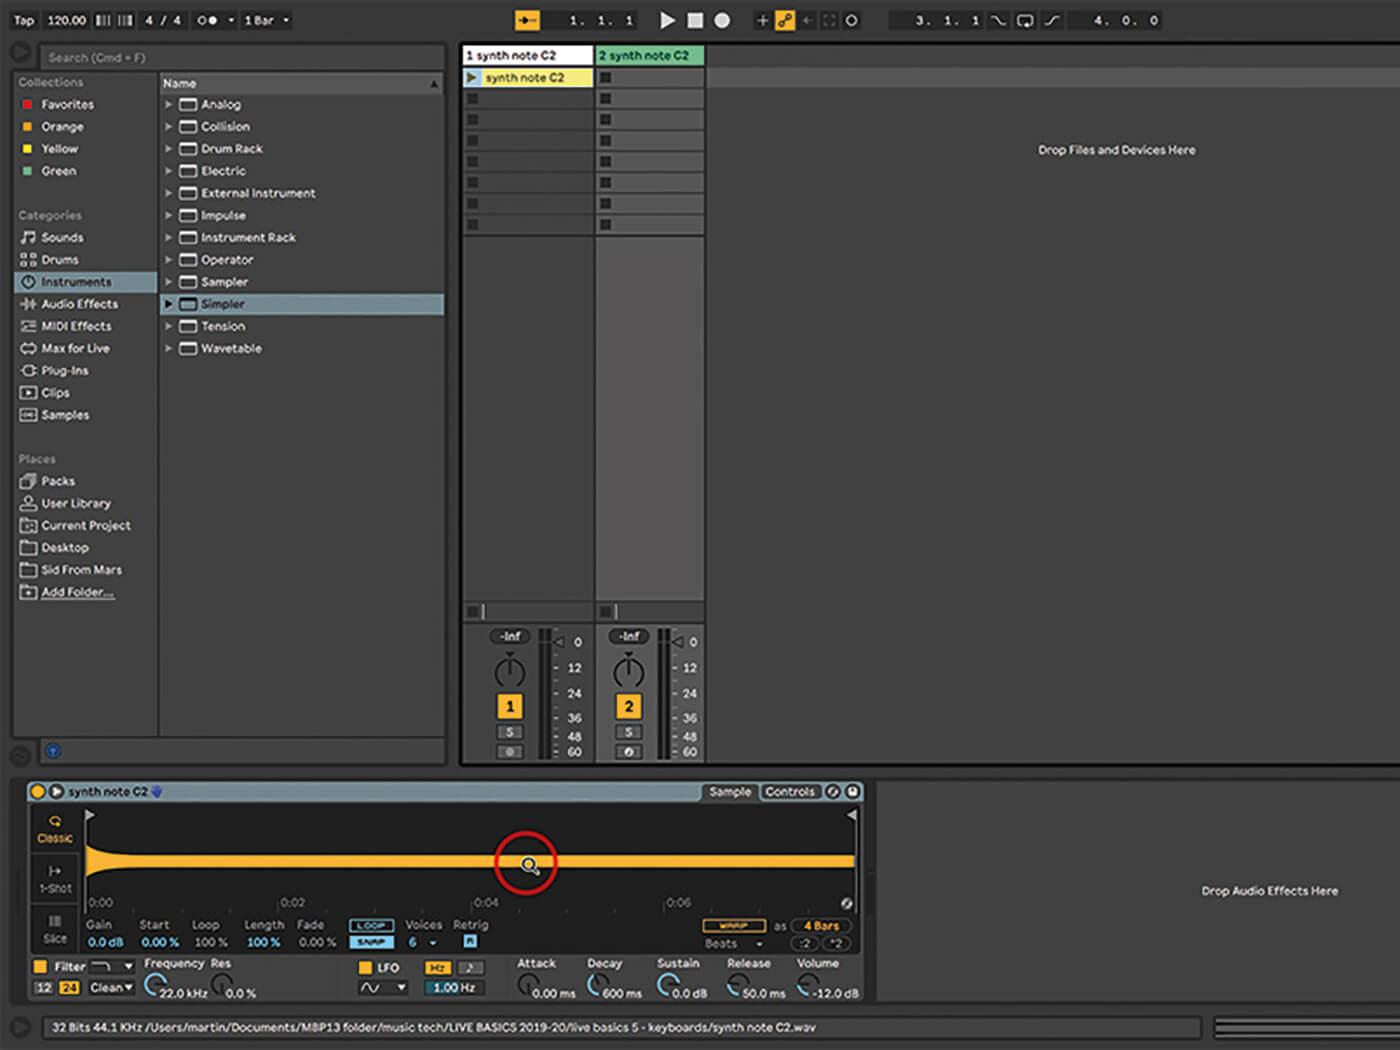 Ableton Live Walkthrough 3